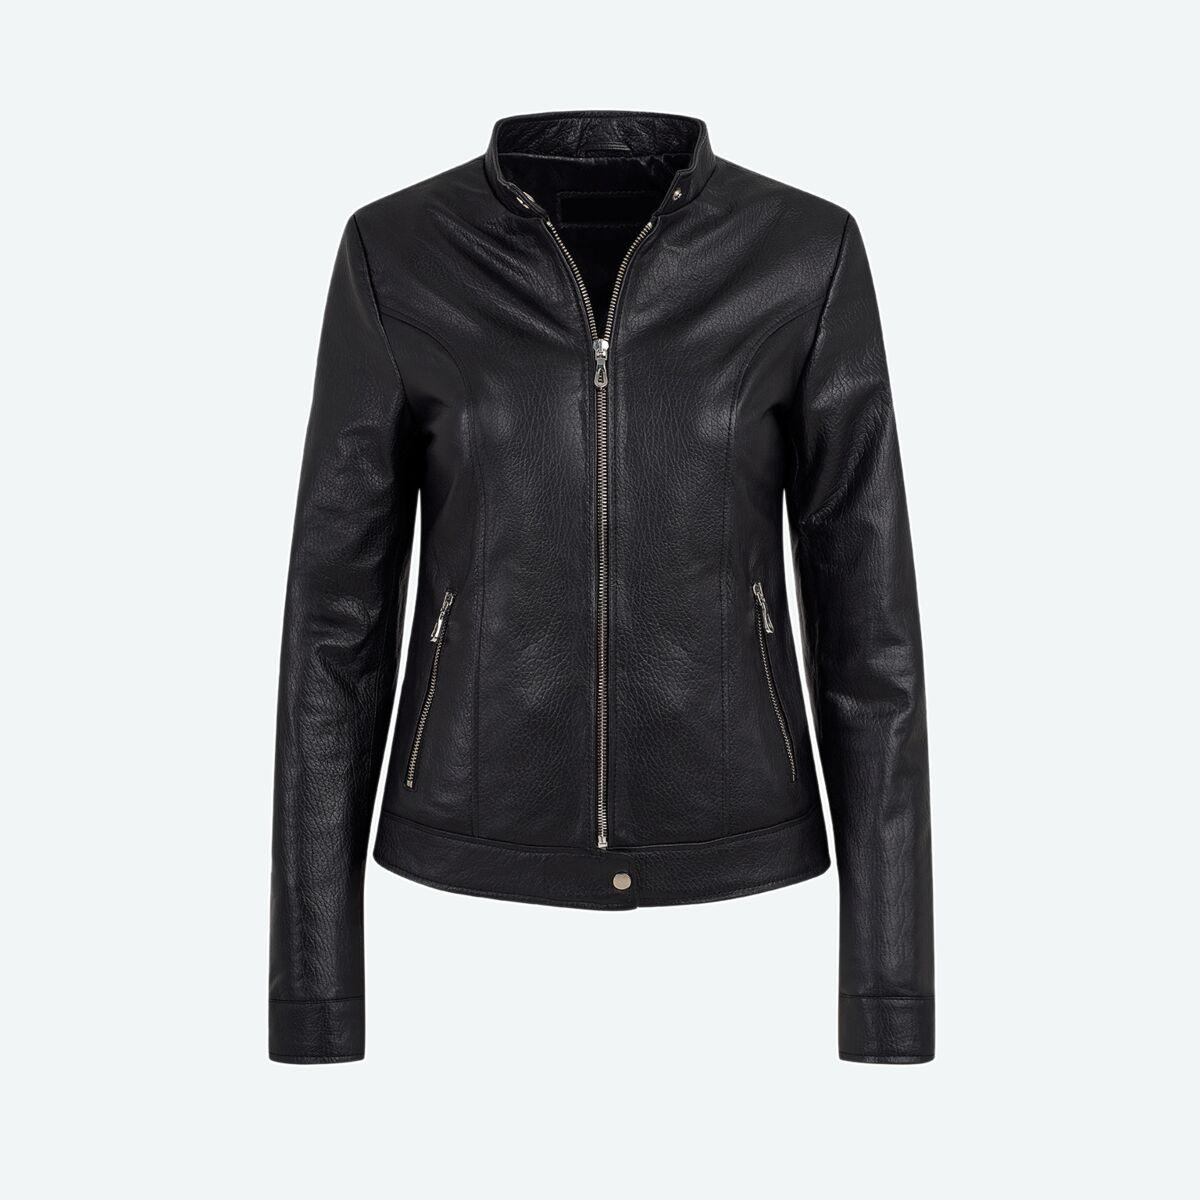 Women's Classic Leather Jacket - Jet Black